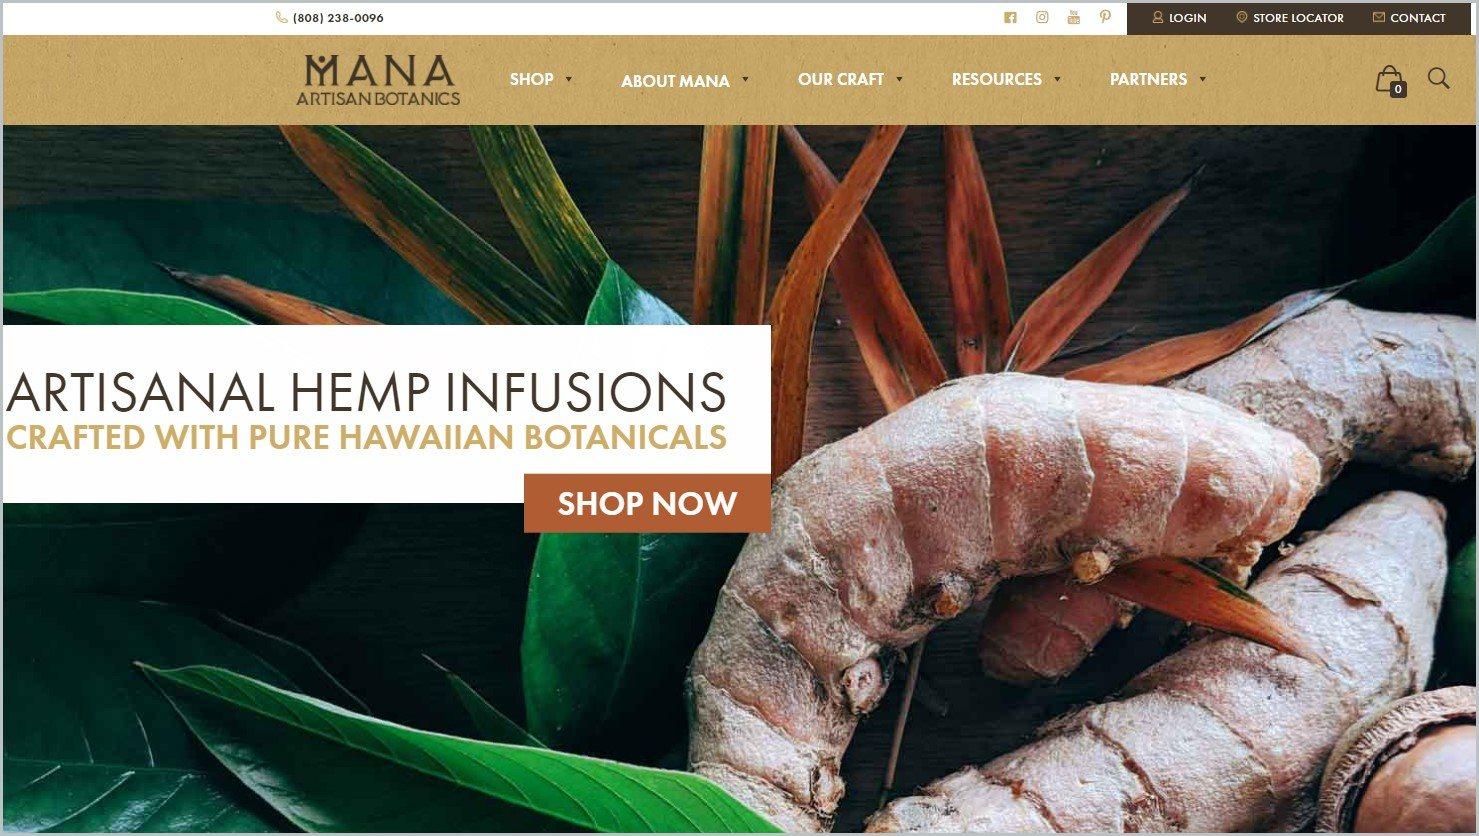 screenshot of Mana Artisan Botanics homepage